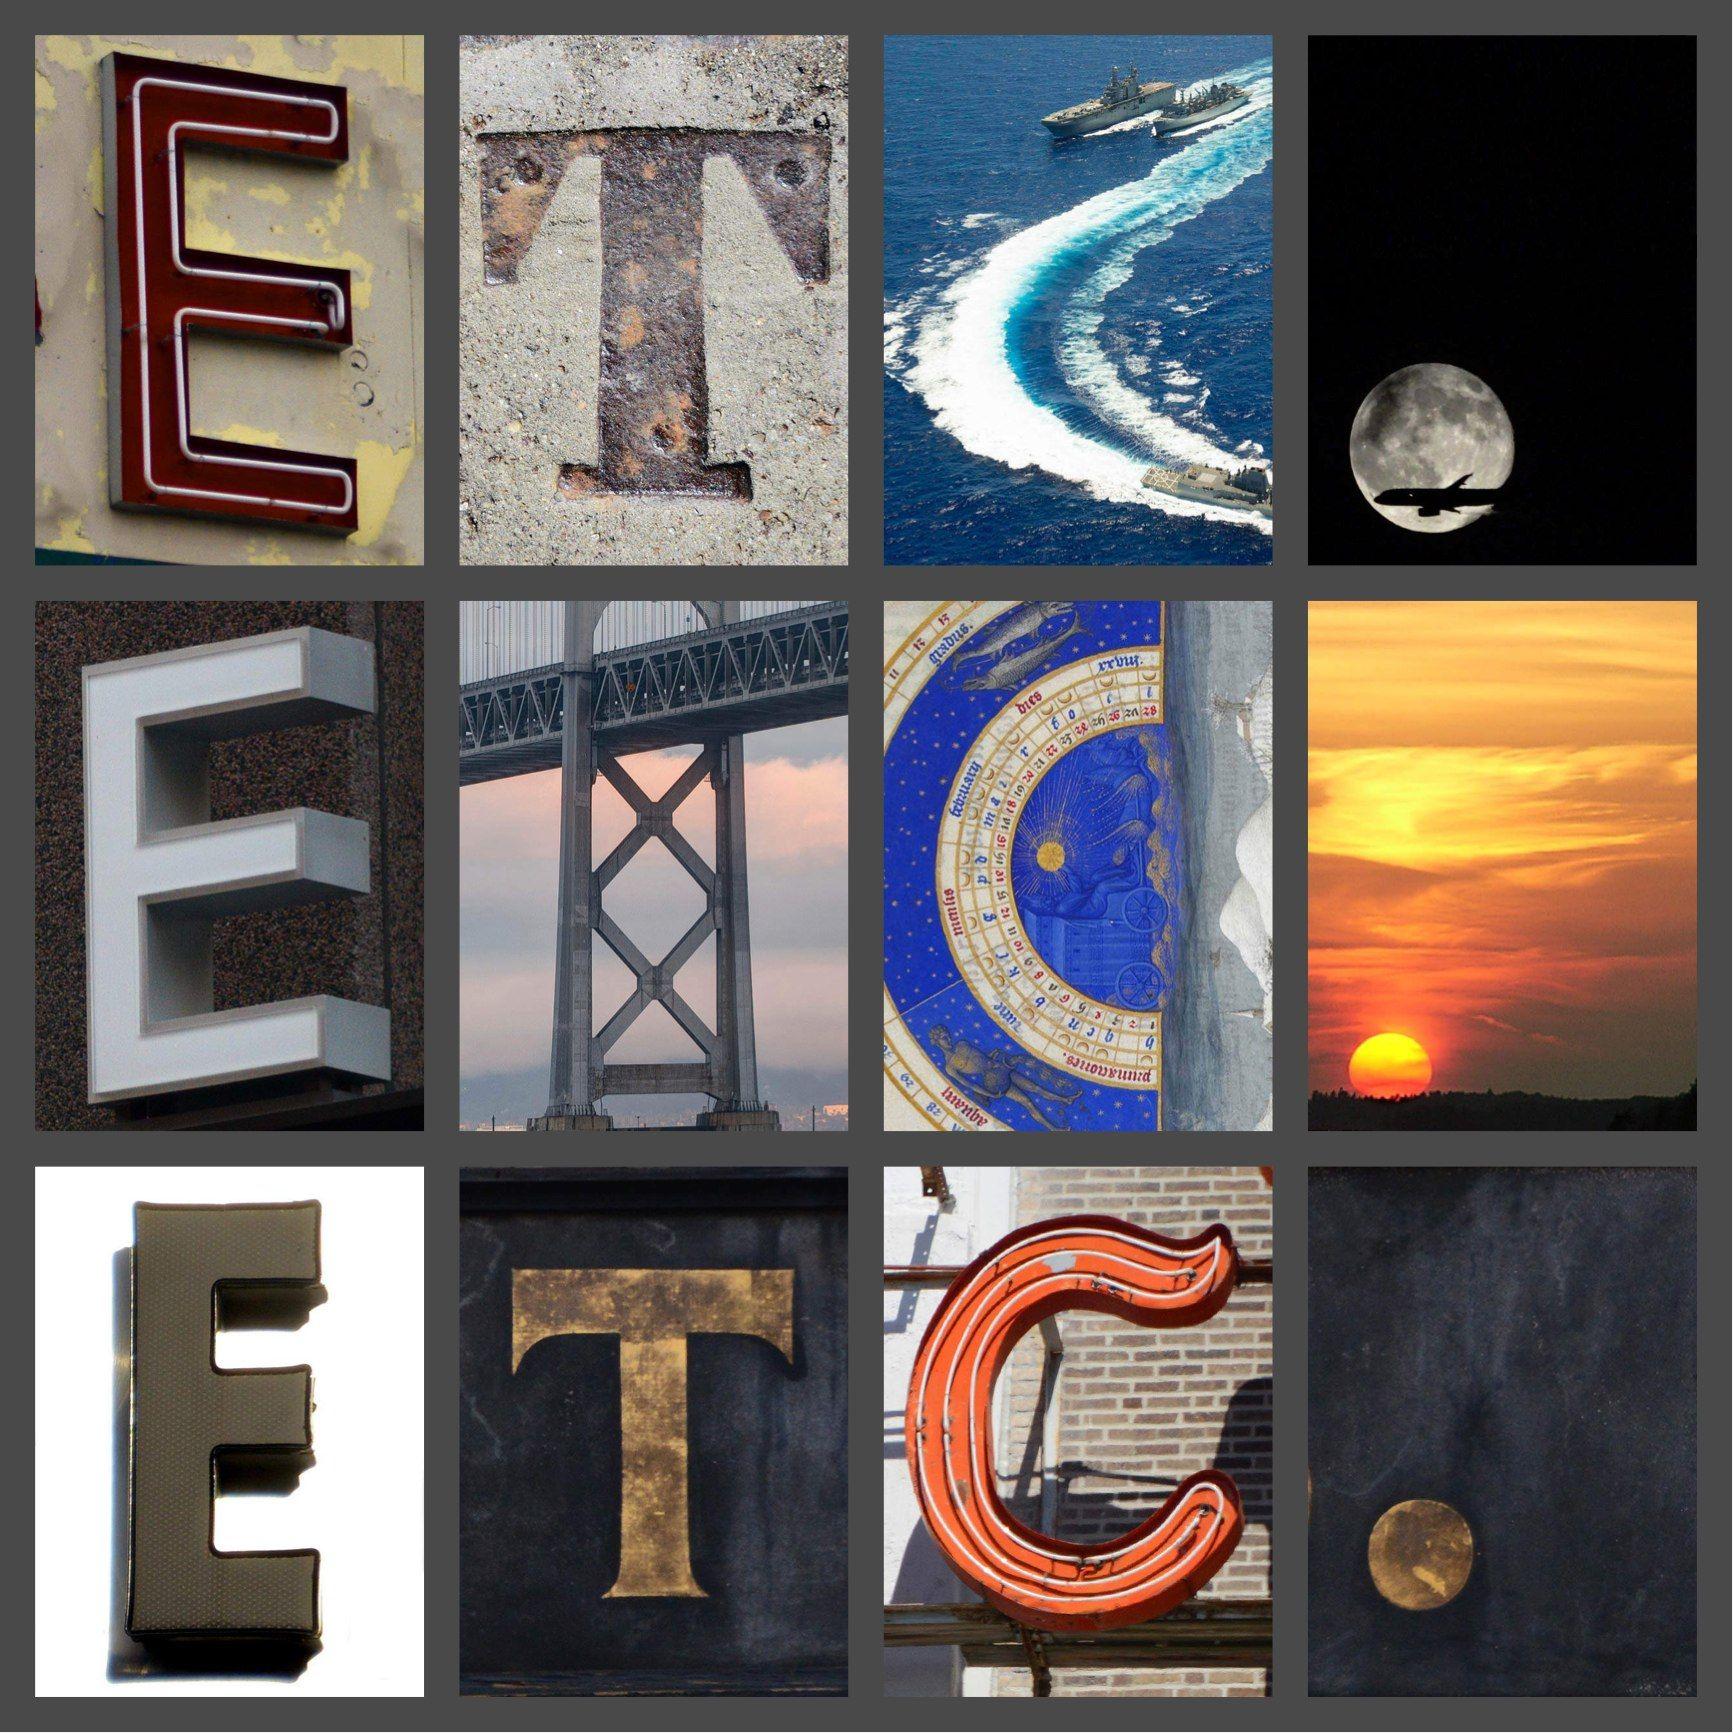 etc., etc., etc. / Created with Alphabet Art for iOS